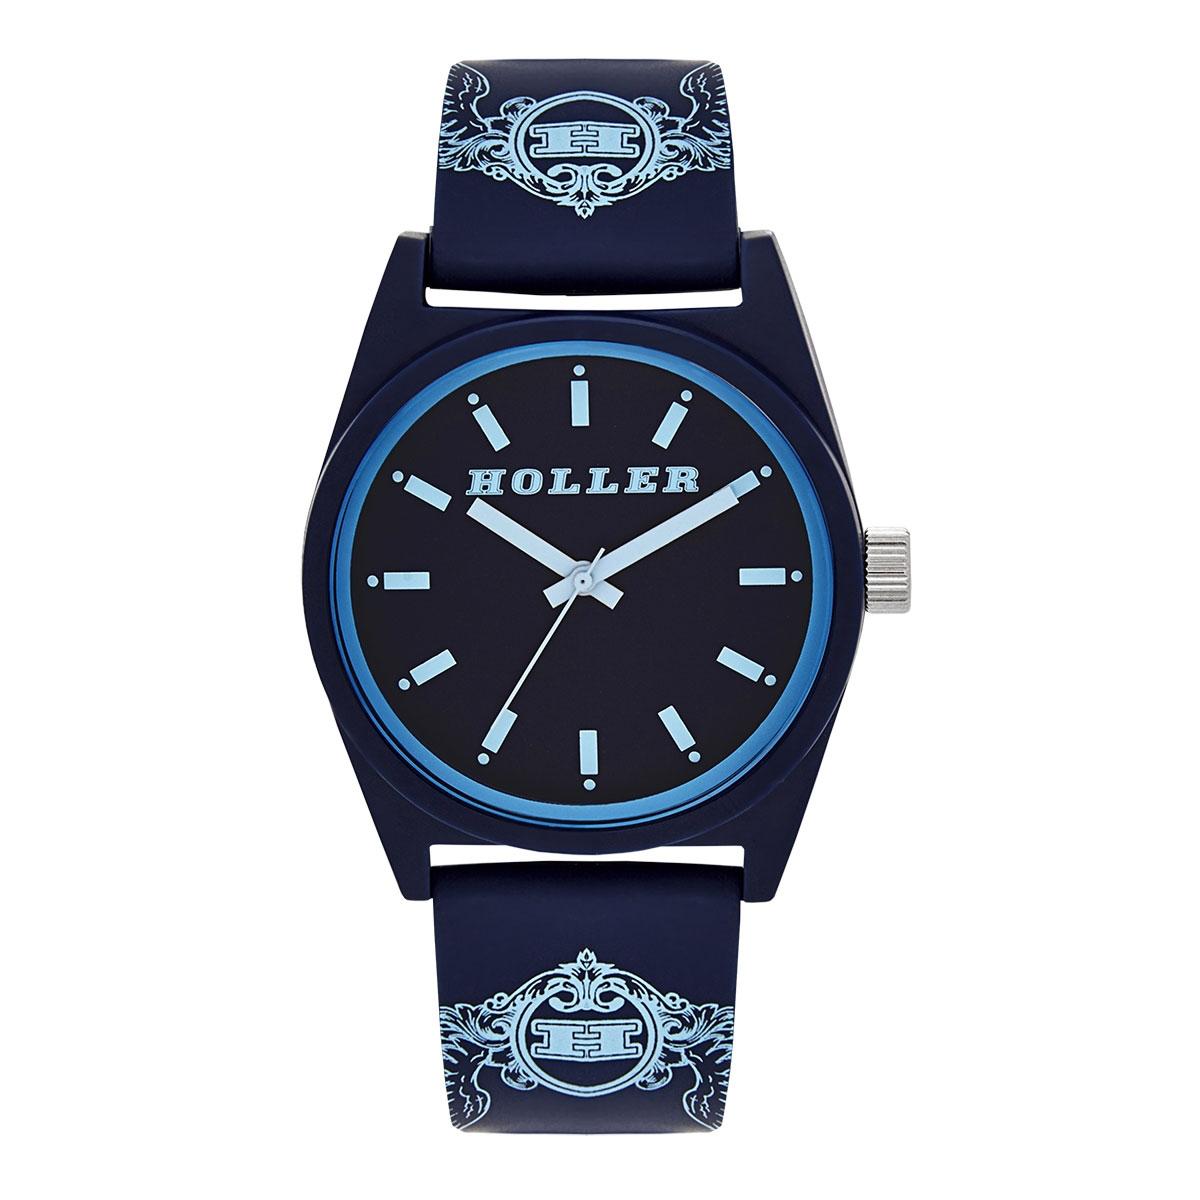 Backbeat Navy and Light Blue Watch